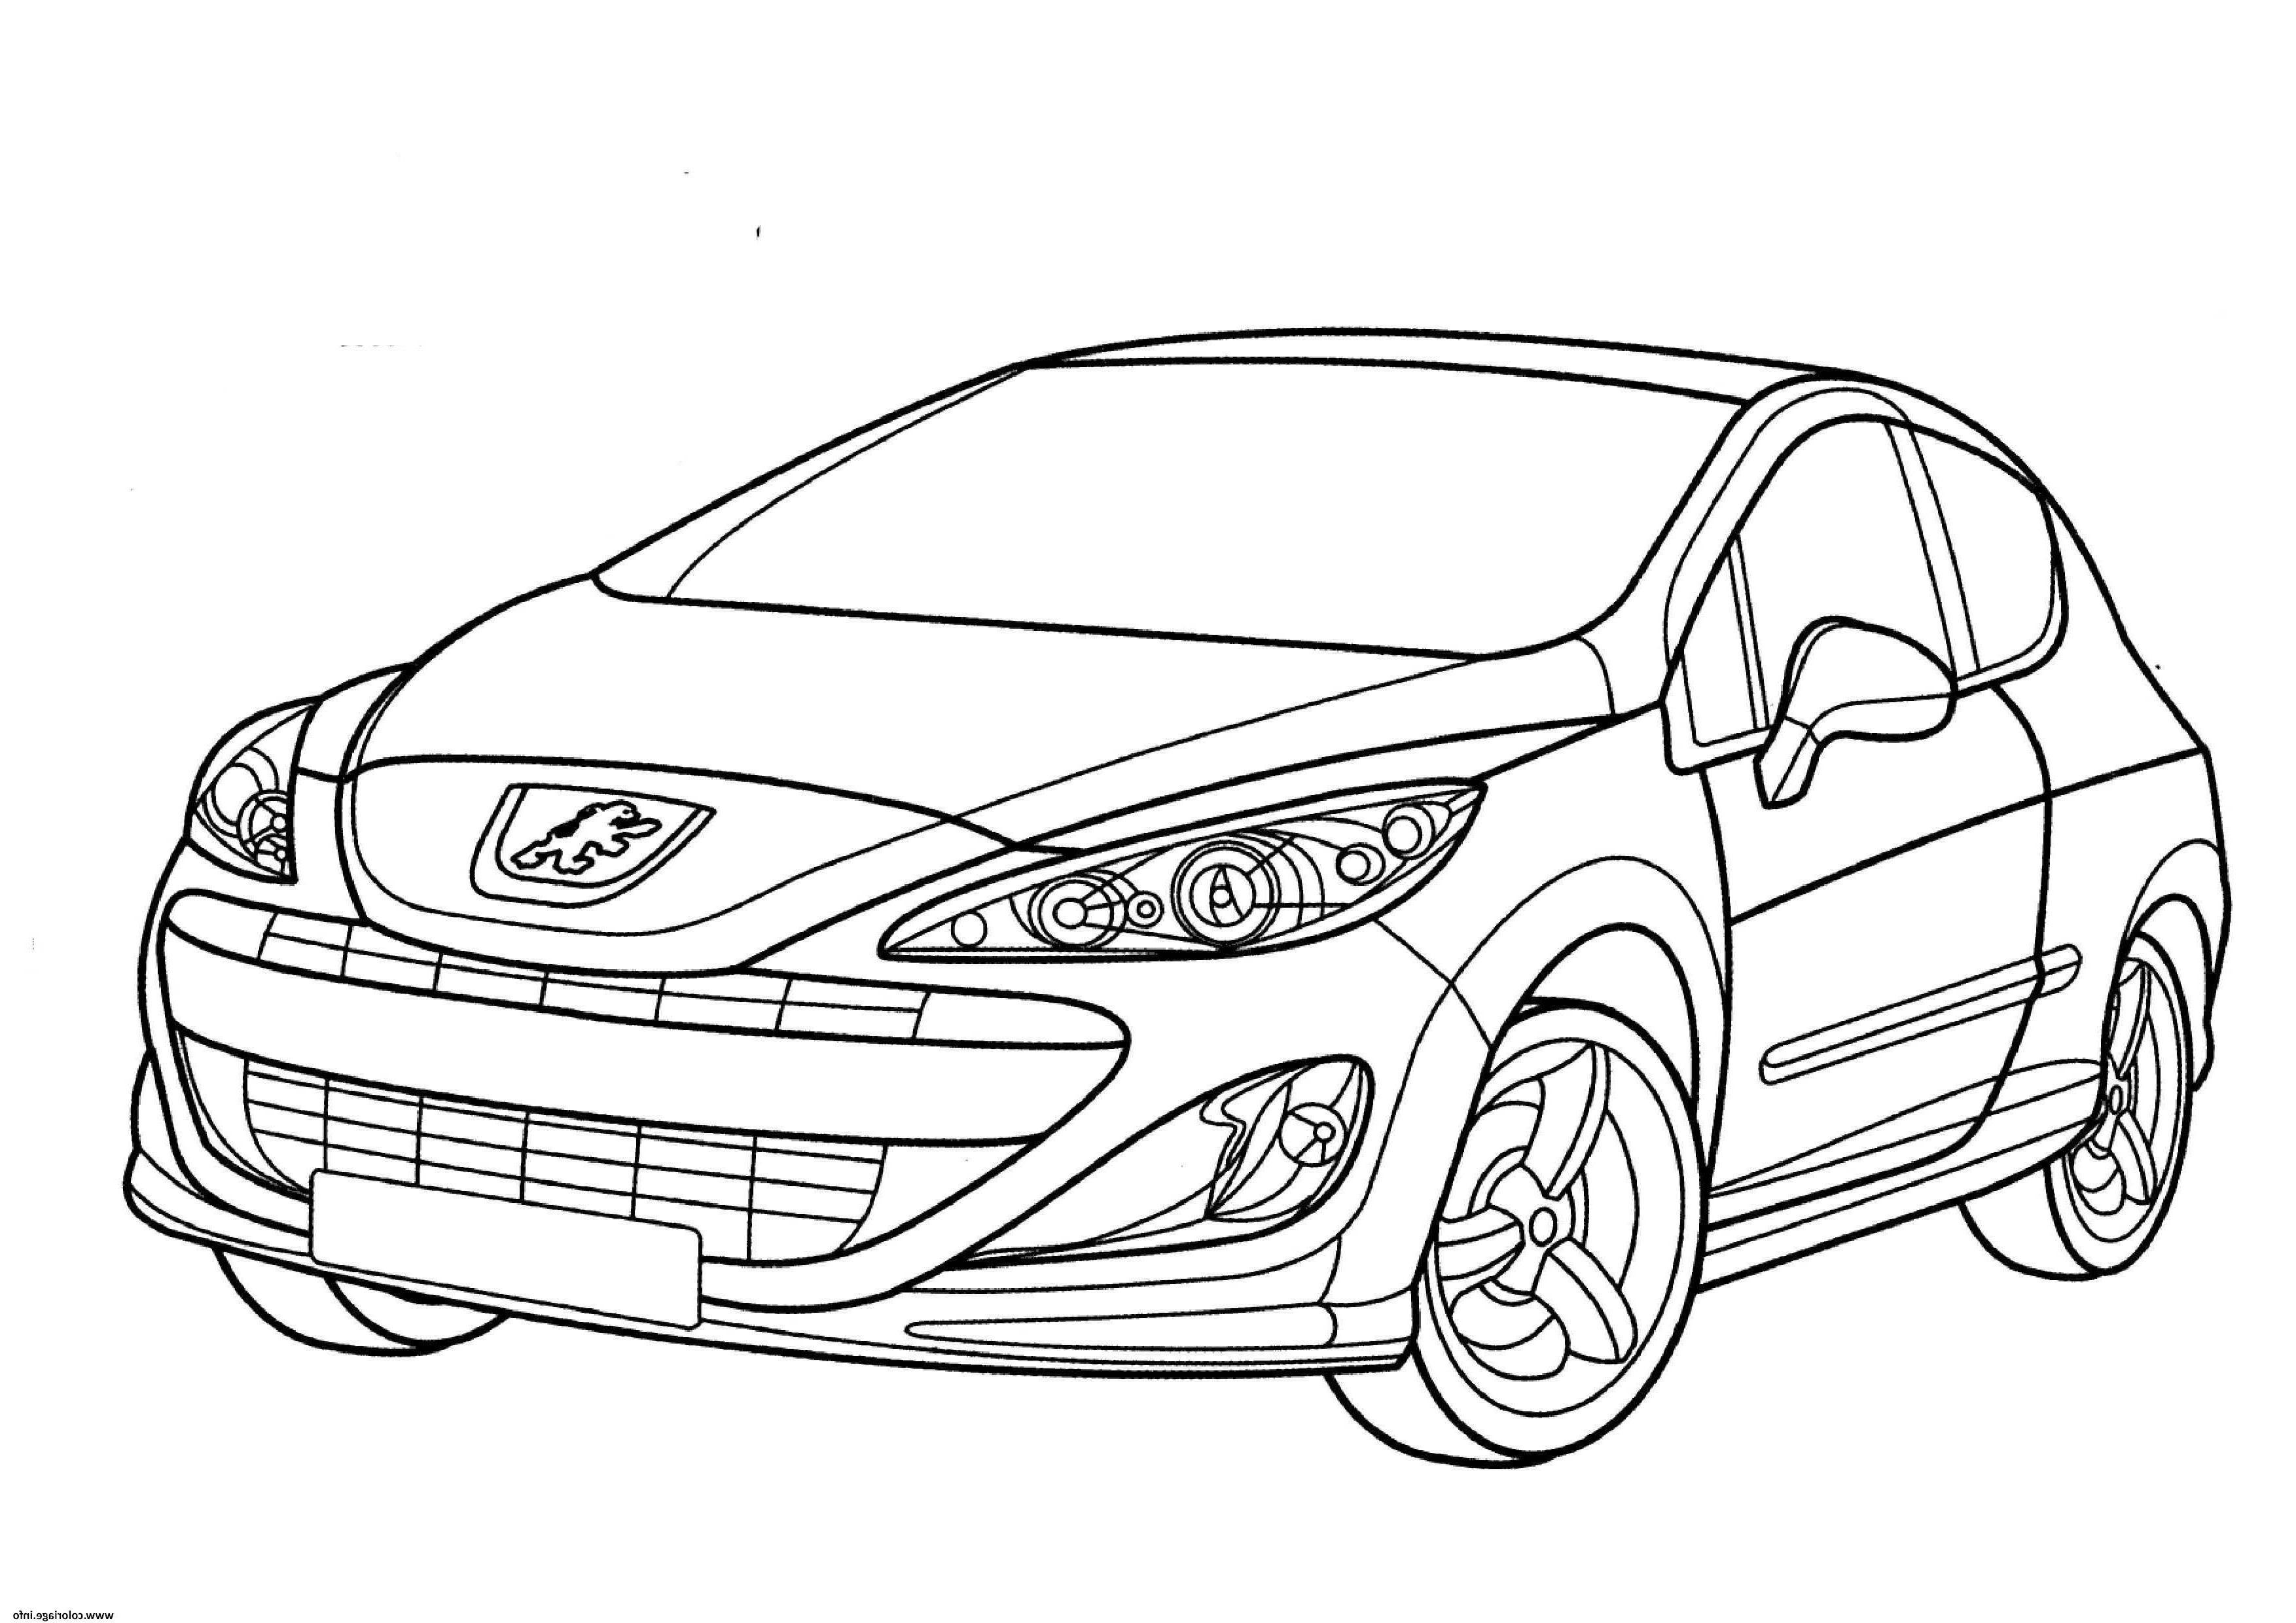 Coloriage Vehicule - Greatestcoloringbook dedans Voiture Int?Rieur Coloriage